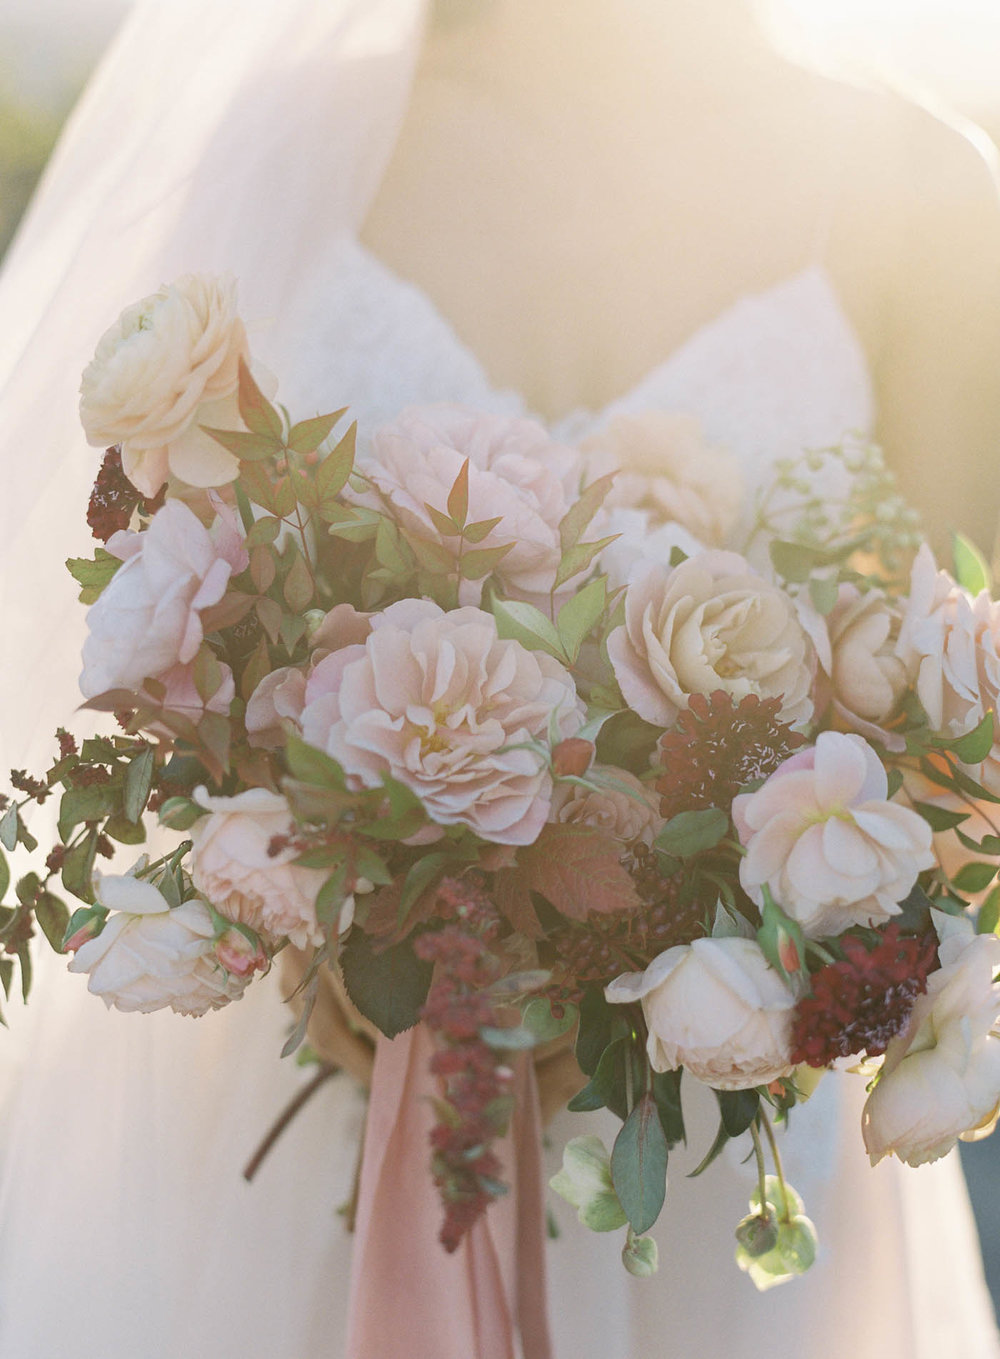 sunstone-villa-wedding-19-Jen_Huang-RD-105-Jen_Huang-009586-R1-002.jpg